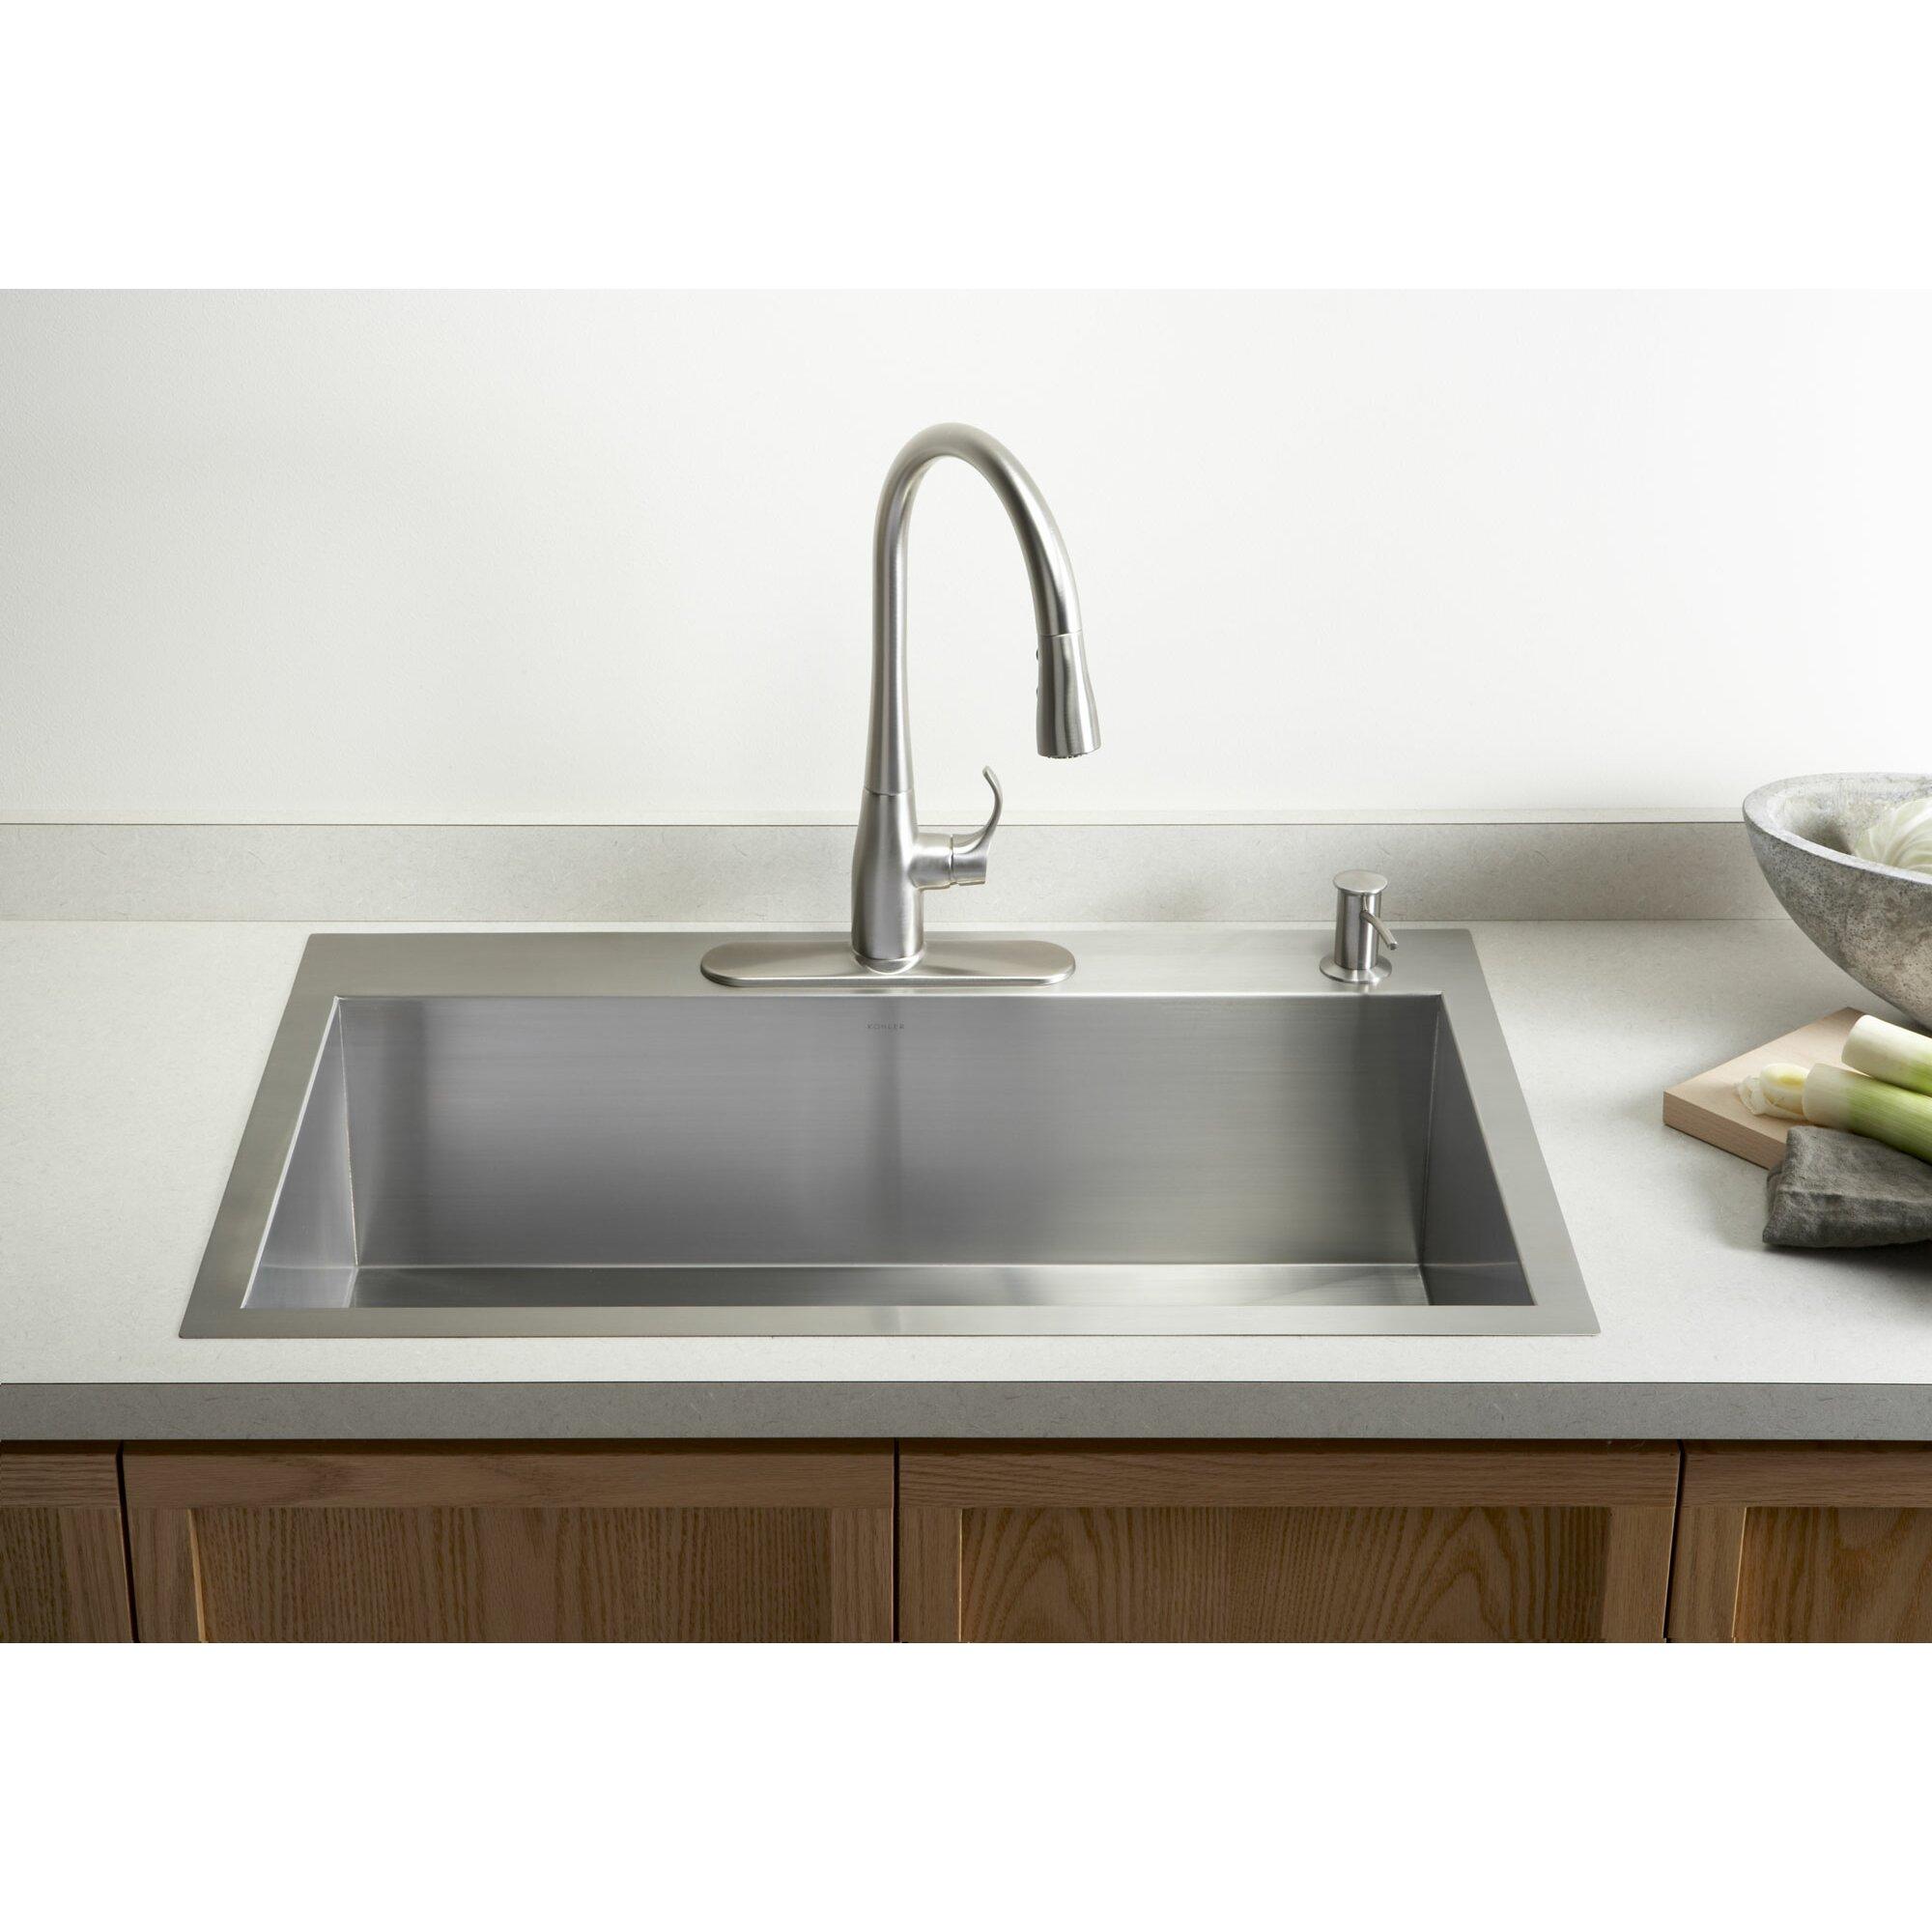 Bowl Sink Faucet : Home Improvement Kitchen Fixtures ... Undermount Kitchen Sinks Kohler ...